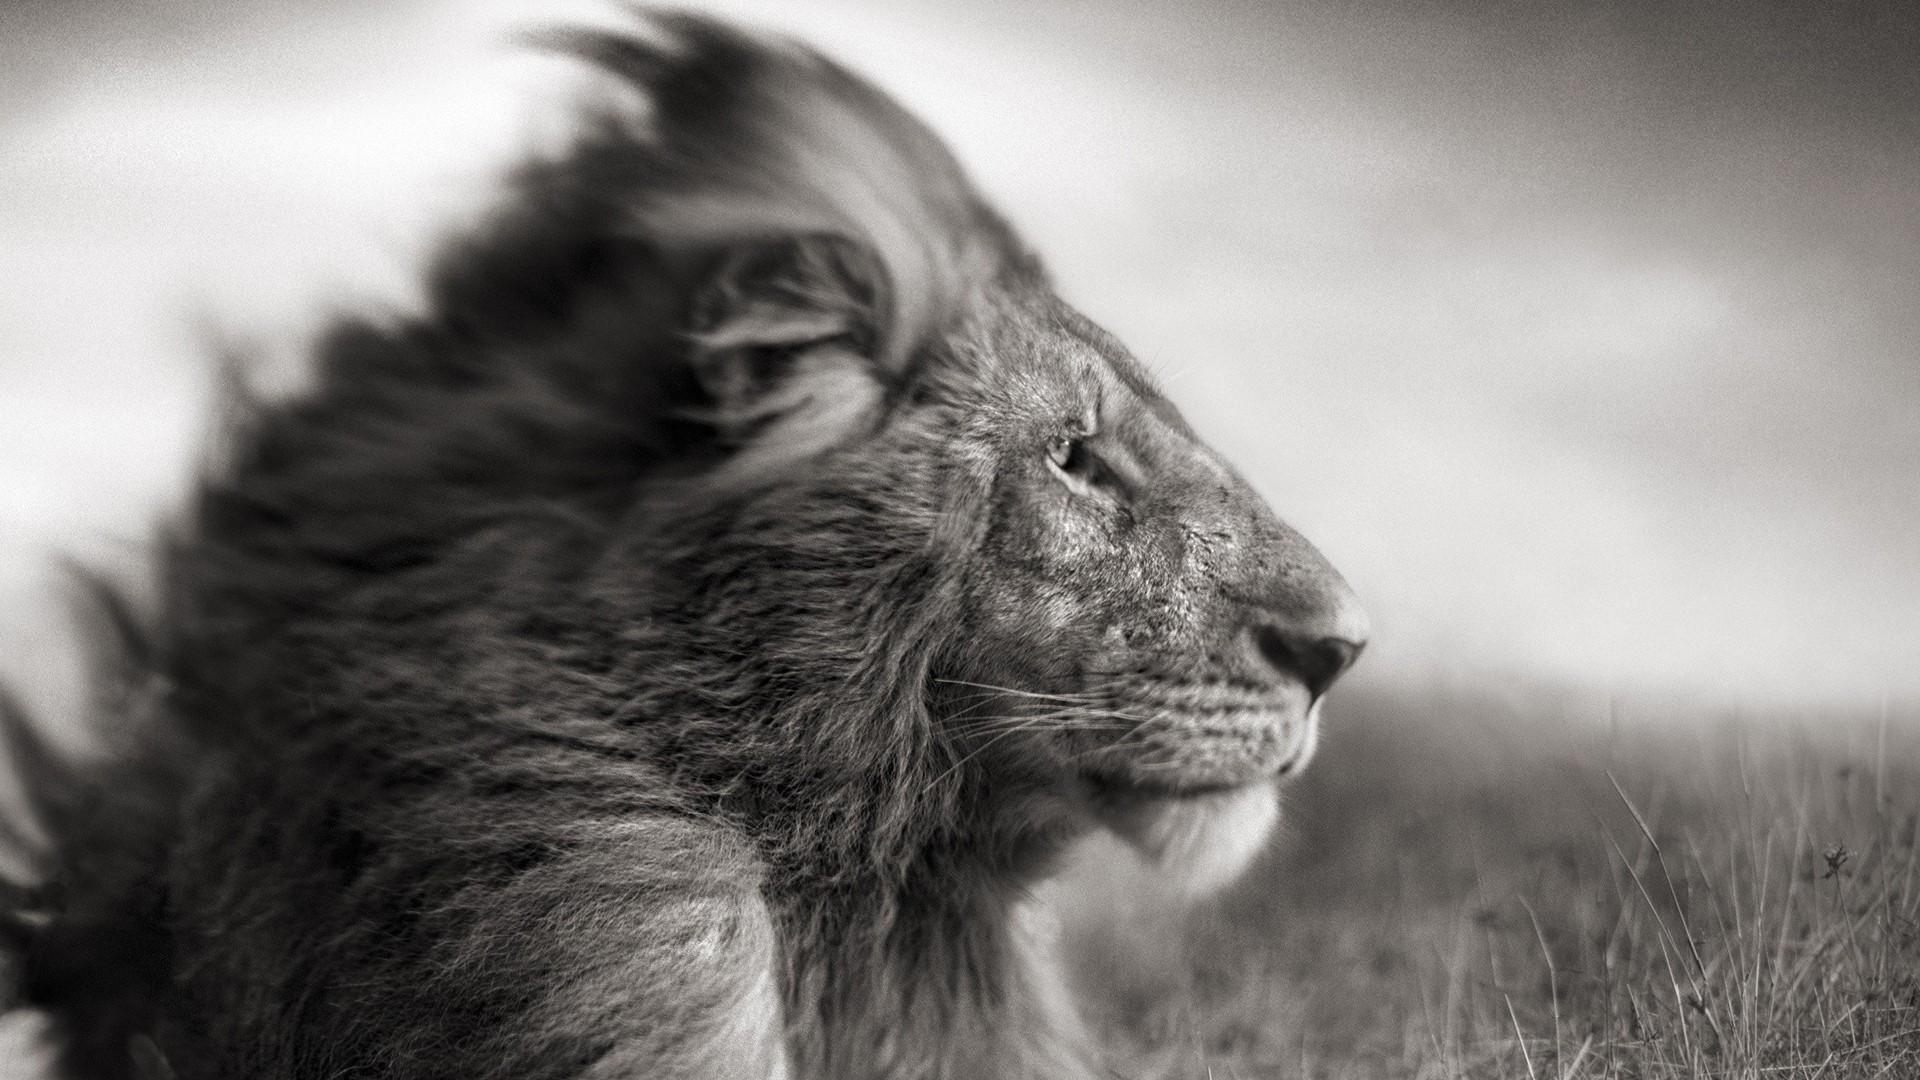 Lion Black And White Wallpaper Hd